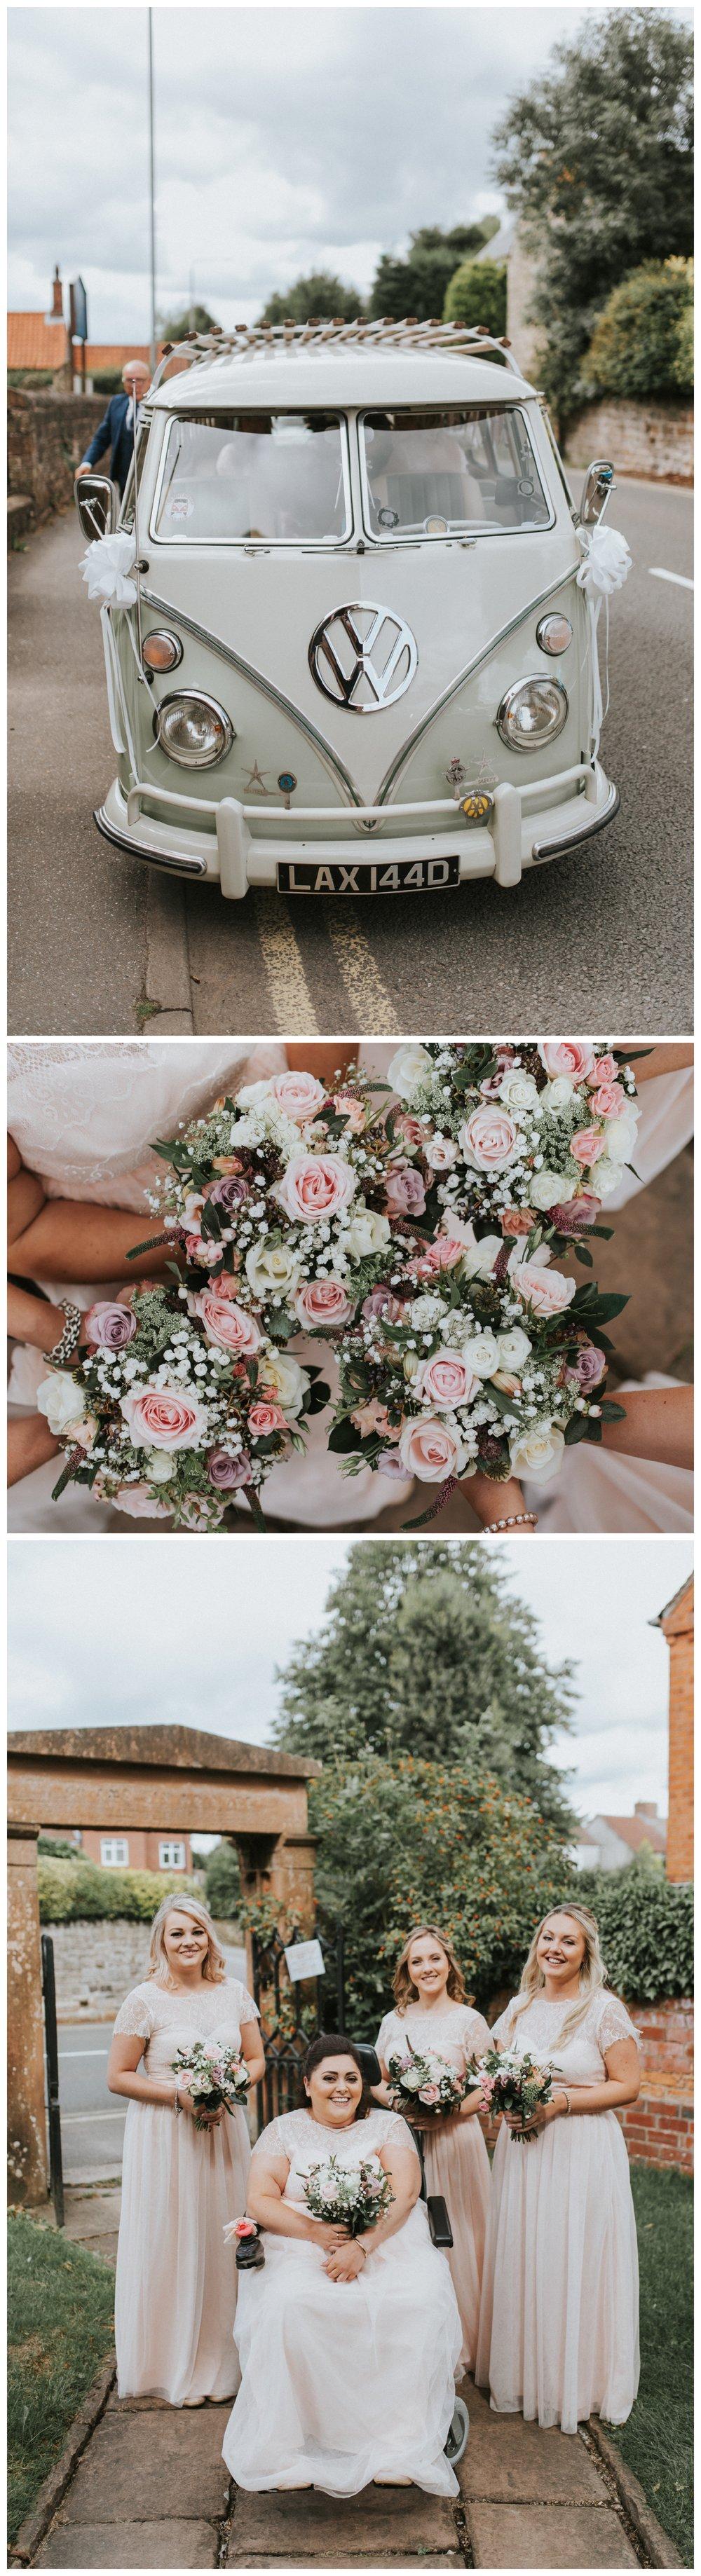 InkersgallGrangeFarm-LukeHolroyd-Yorkshirewedding_0035.jpg